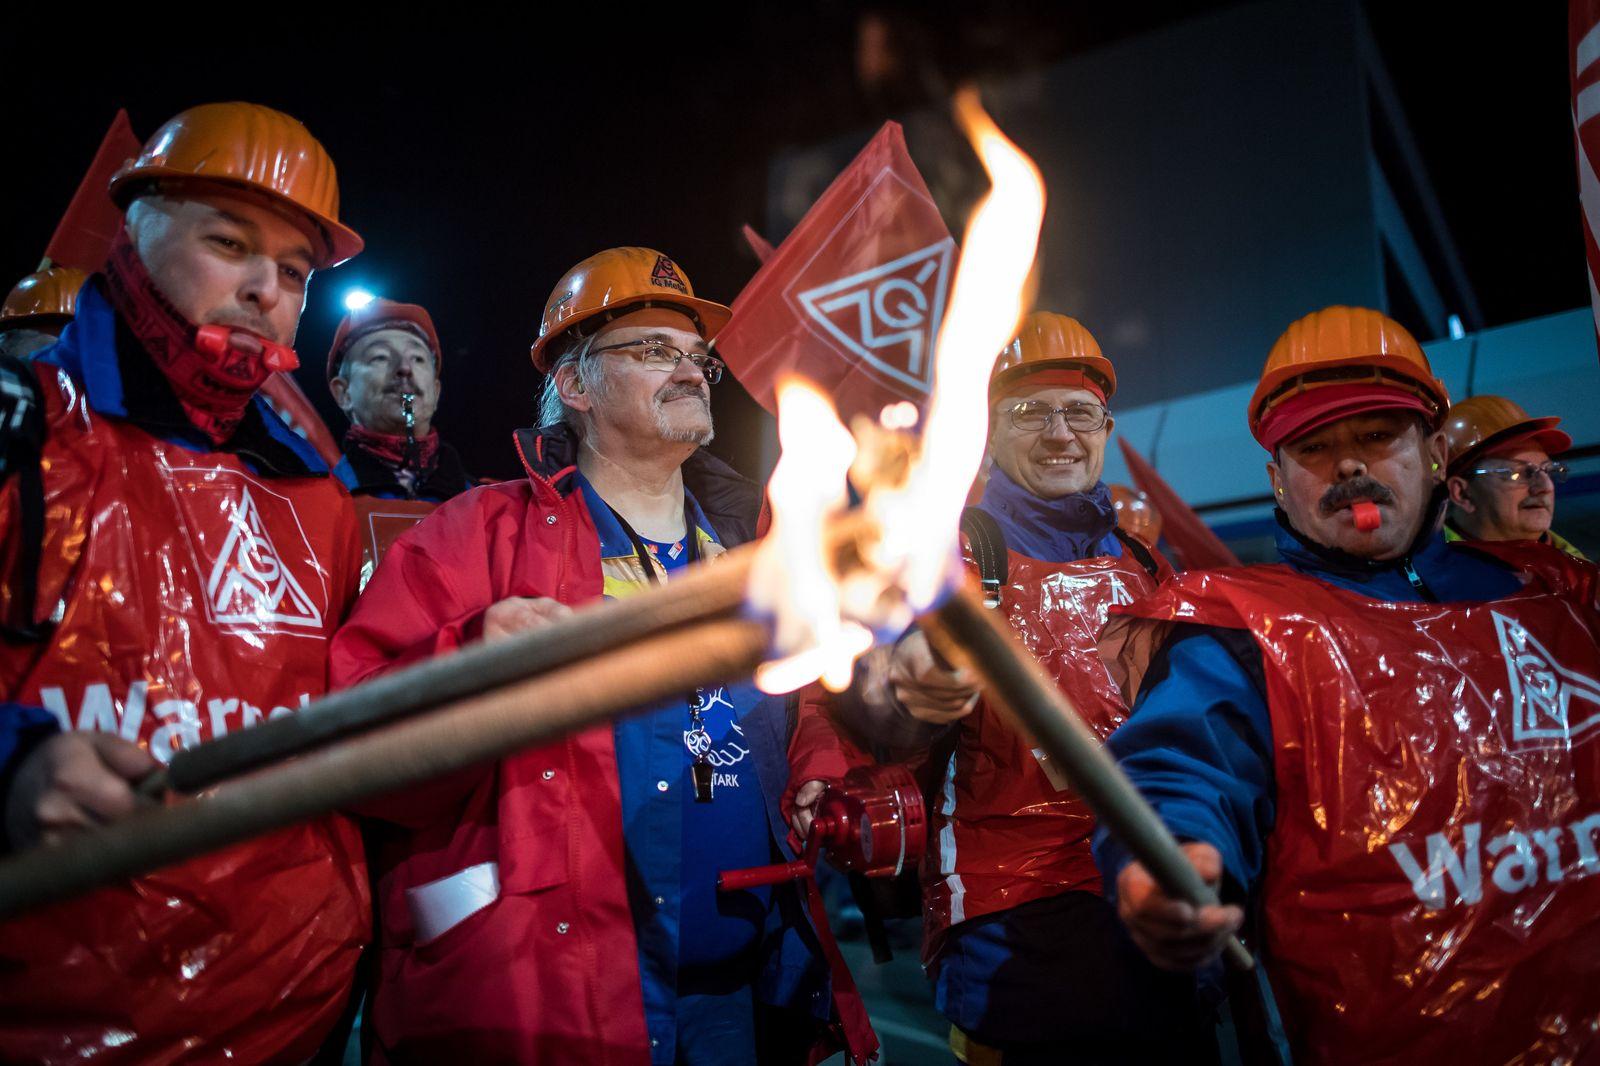 IG Metall / Warnstreiks / Metallindustrie